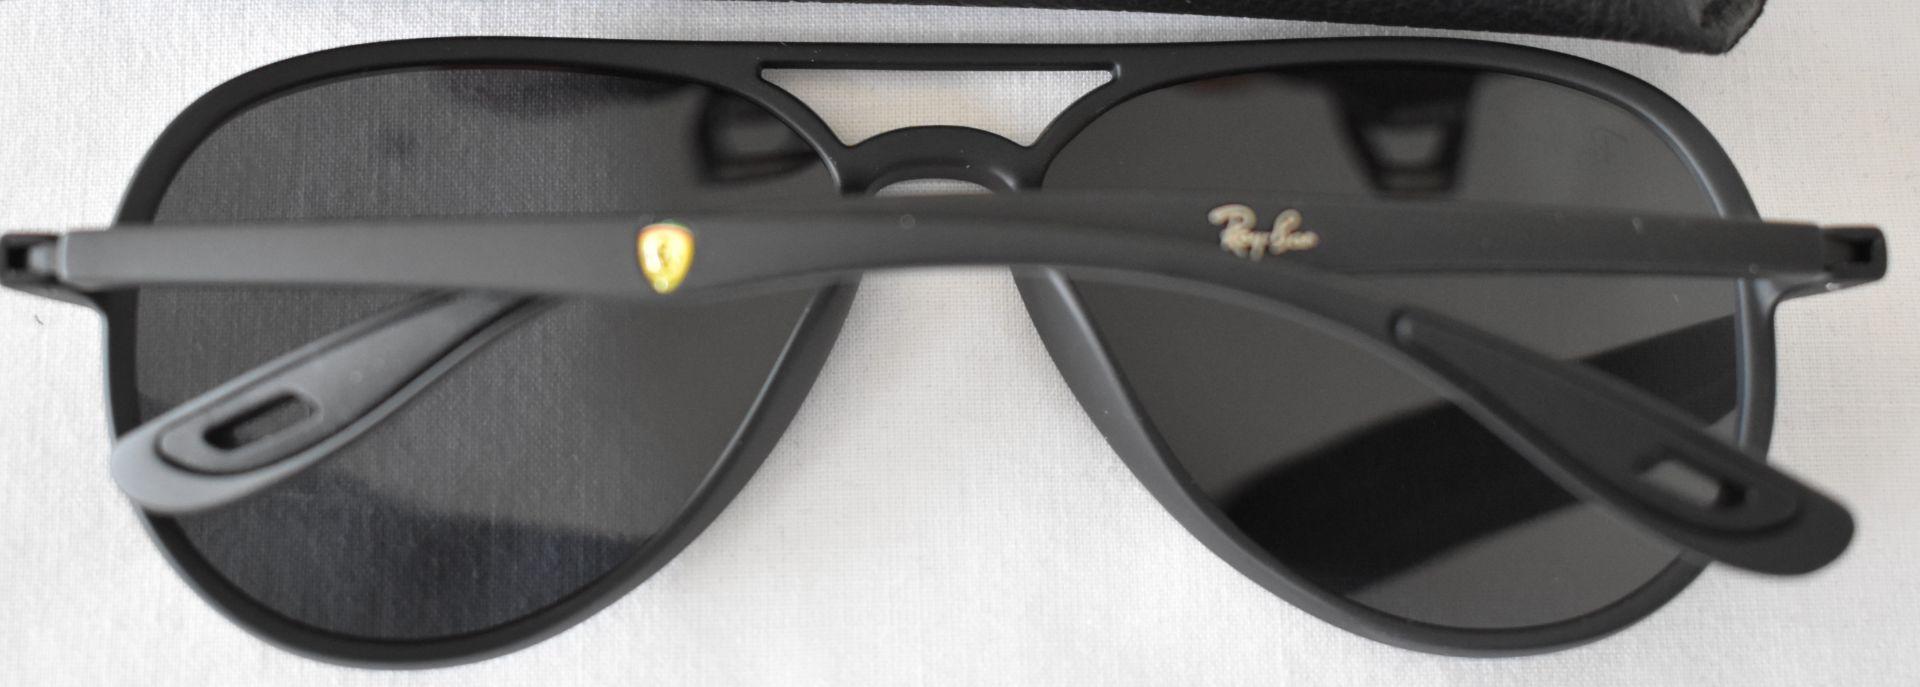 Ray Ban Sunglasses(Ferrari) ORB4320CH 622/87 *3P - Image 3 of 3